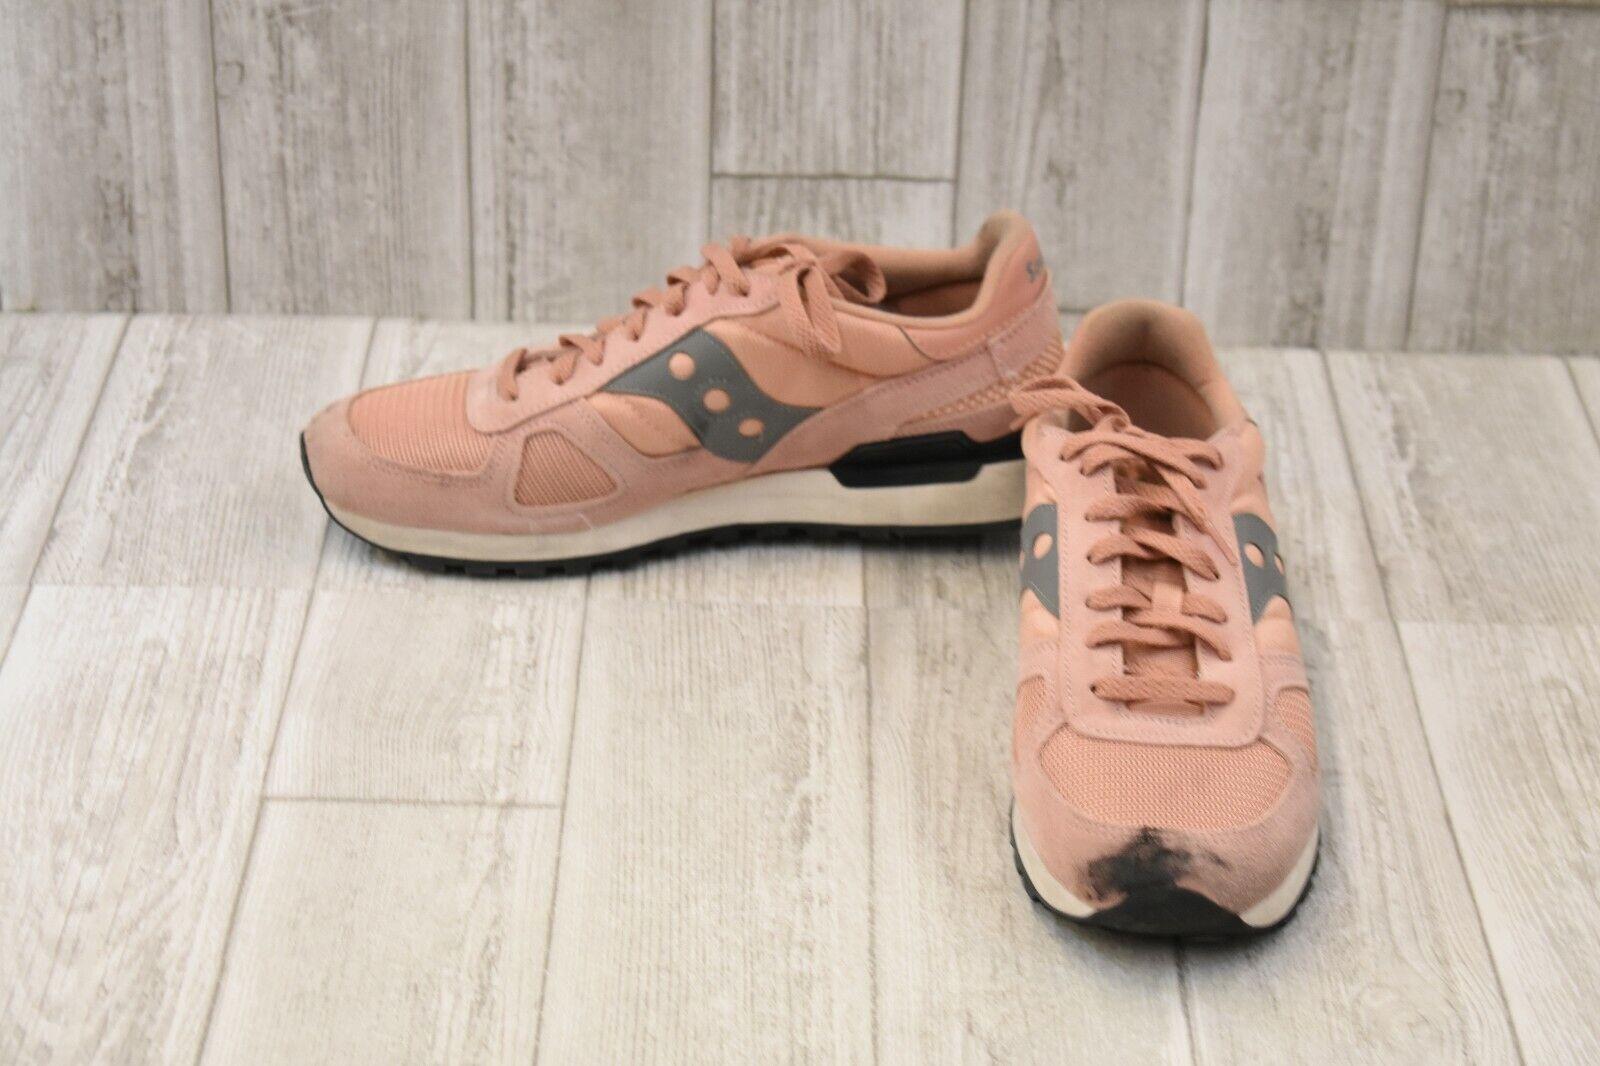 Saucony Shadow Original Running shoes, Men's Size 10.5, Pink Grey